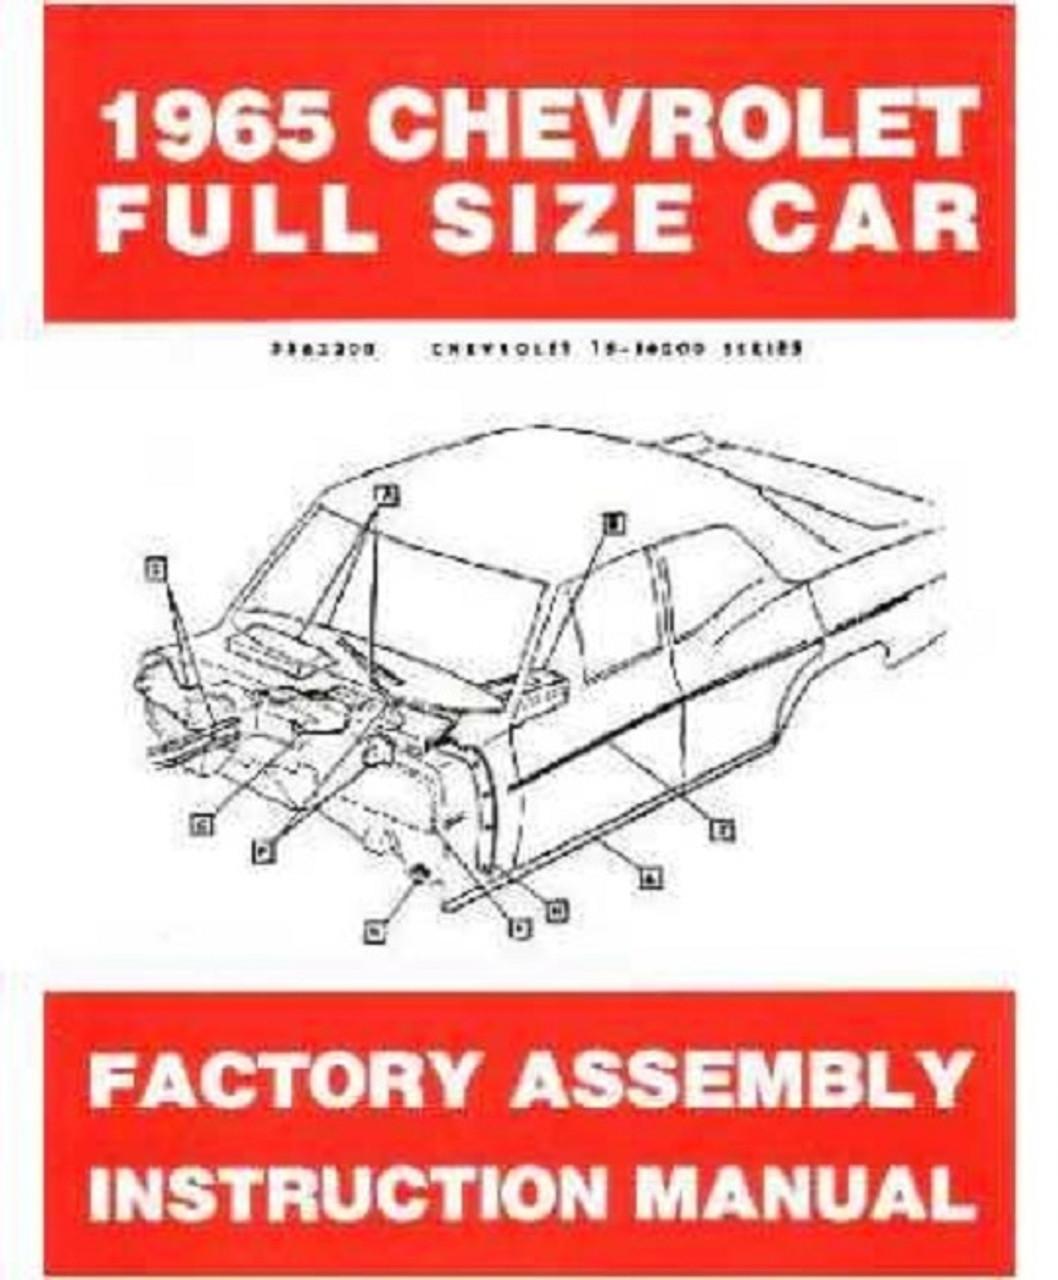 L1420_zpsfeqrbtsw__79592.1463609799?c=2 65 1965 chevy impala electrical wiring diagram manual i 5 1965 impala wiring diagram at crackthecode.co